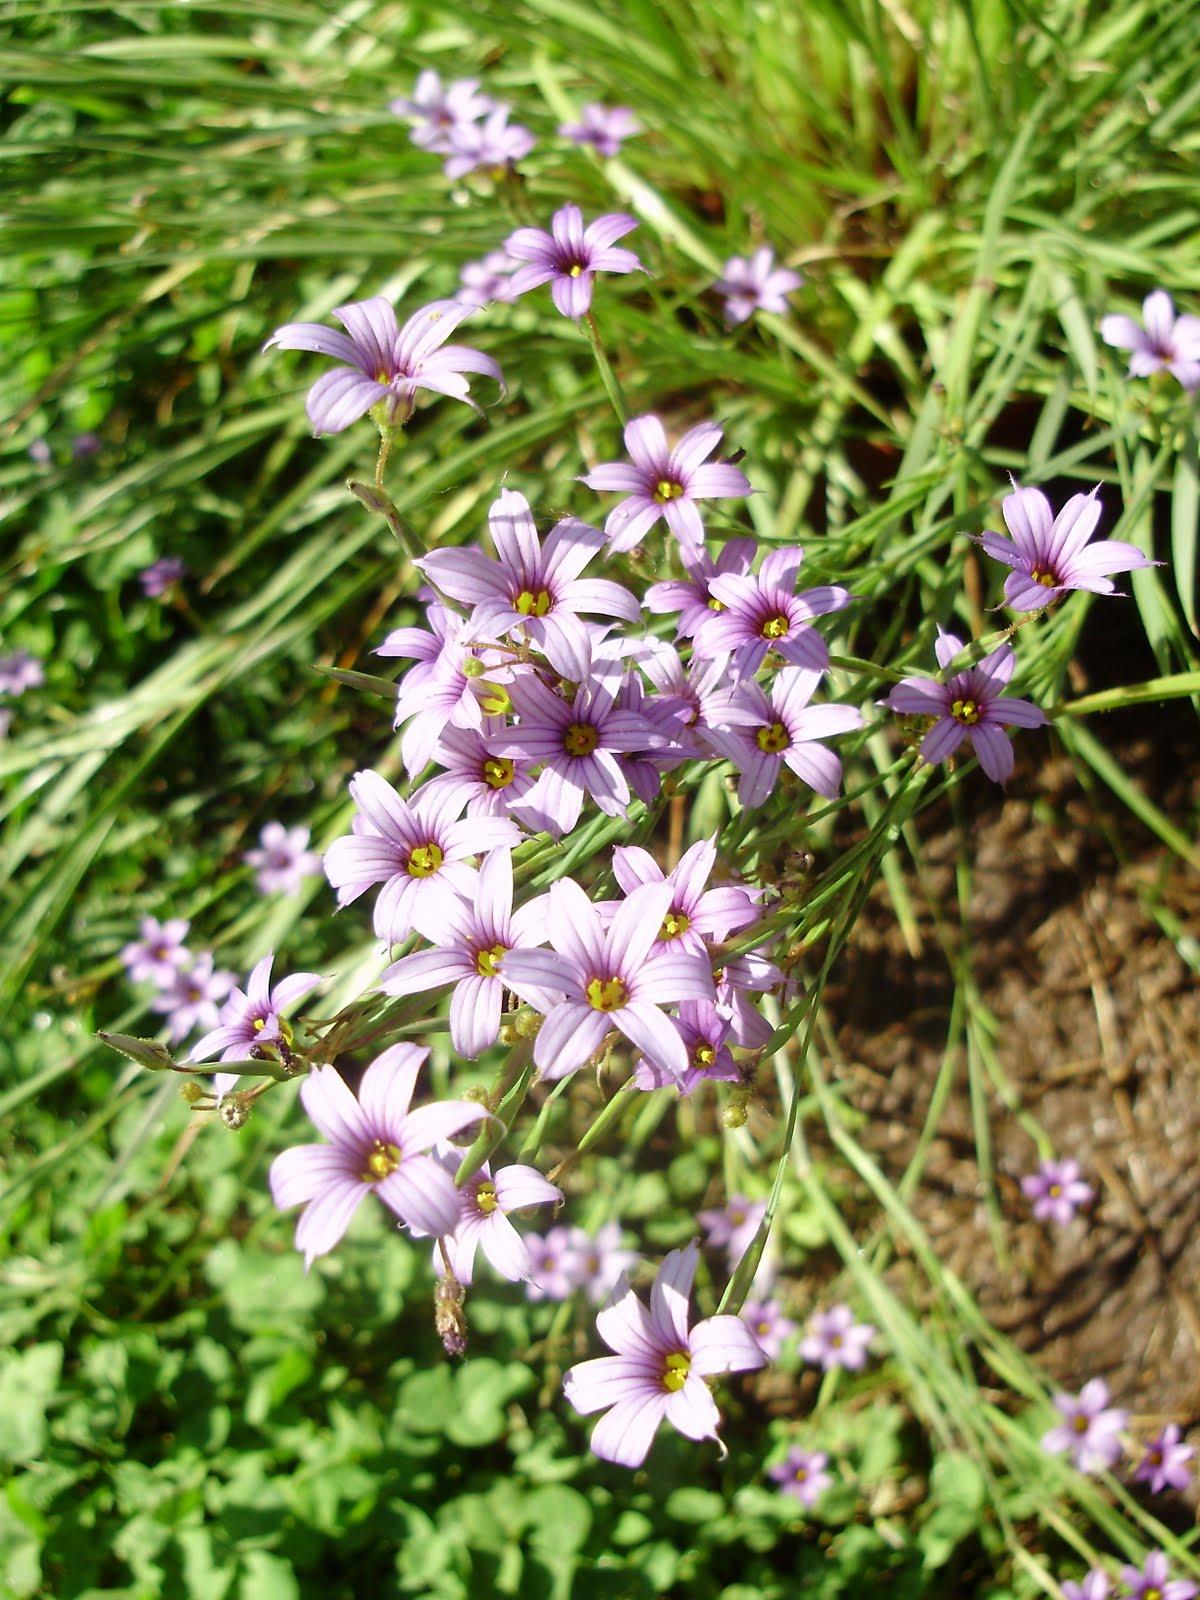 Qinti wasi plantas nativas de argentina sisyrinchium for Vivero plantas nativas